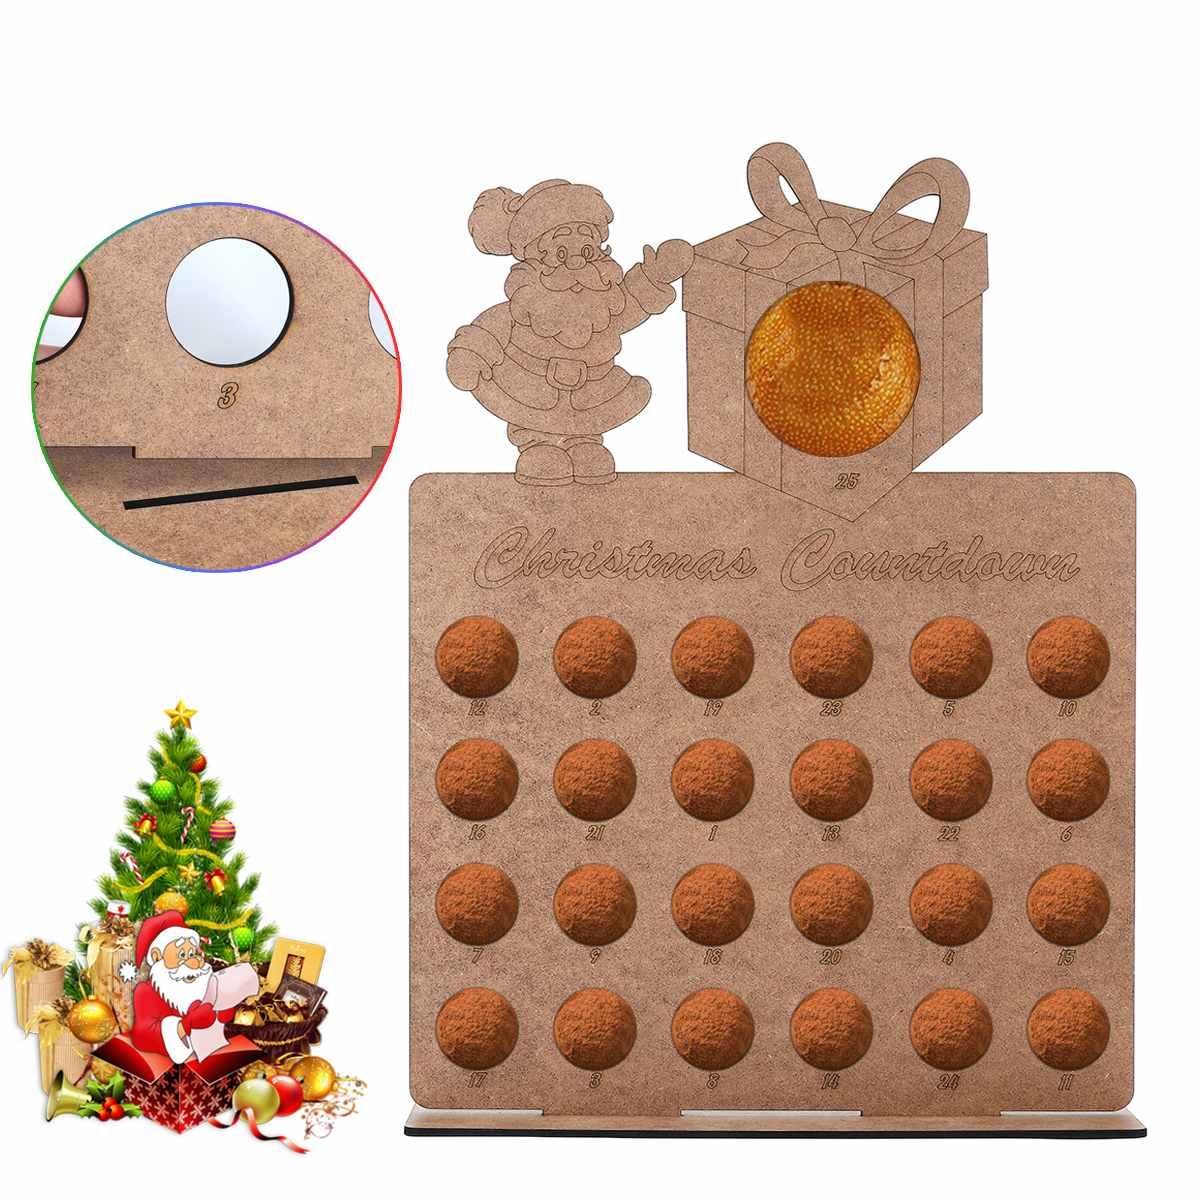 1pcs Wooden Christmas Advent Calendar Santa Claus Elk Handmade New Year Hollow Out Countdown Home Decor Chocolate Holder